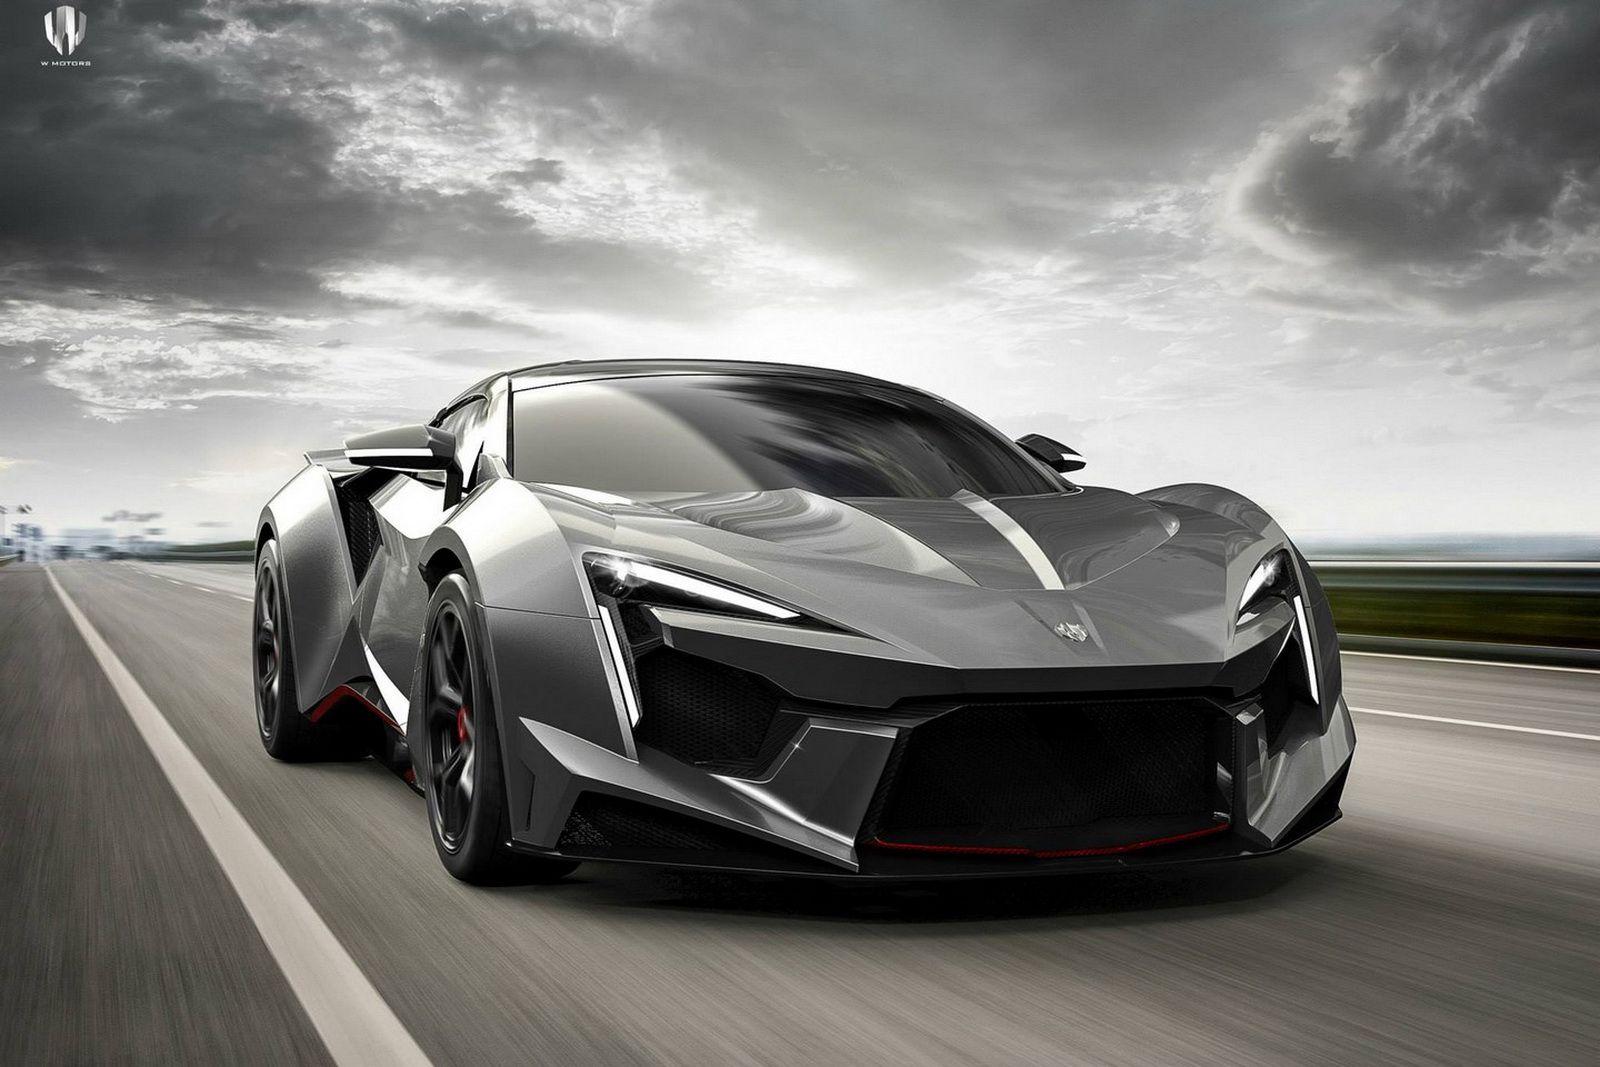 New Fenyr Supersport Revealed At Dubai Delivers Over 900hp 248mph Carscoops Lykan Hypersport Super Sport Cars Sports Car Wallpaper